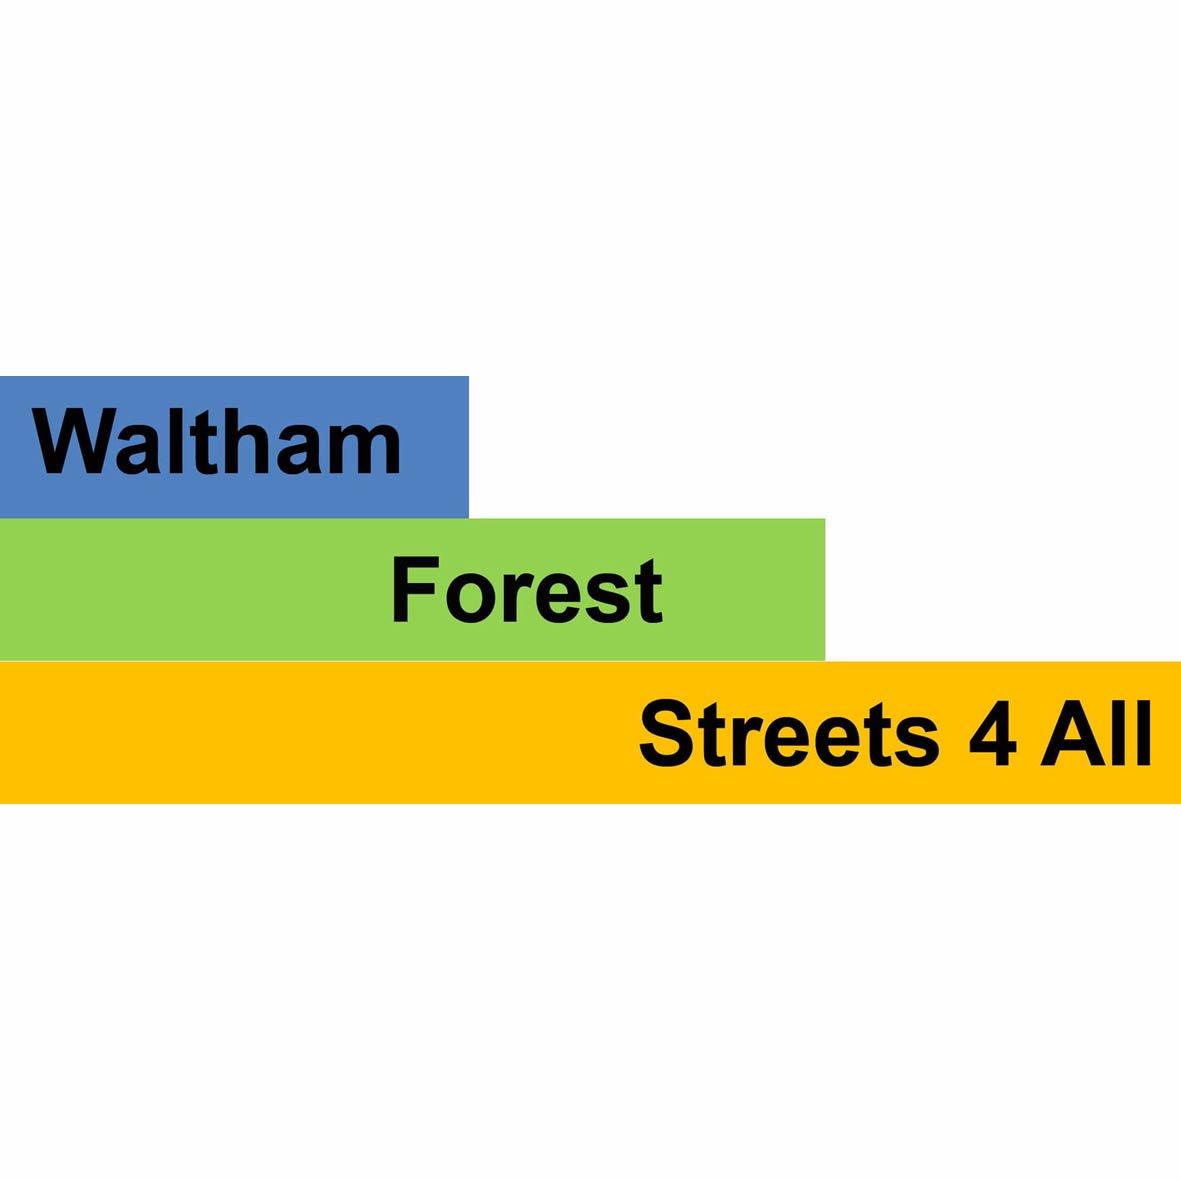 WF Streets #streetsforall